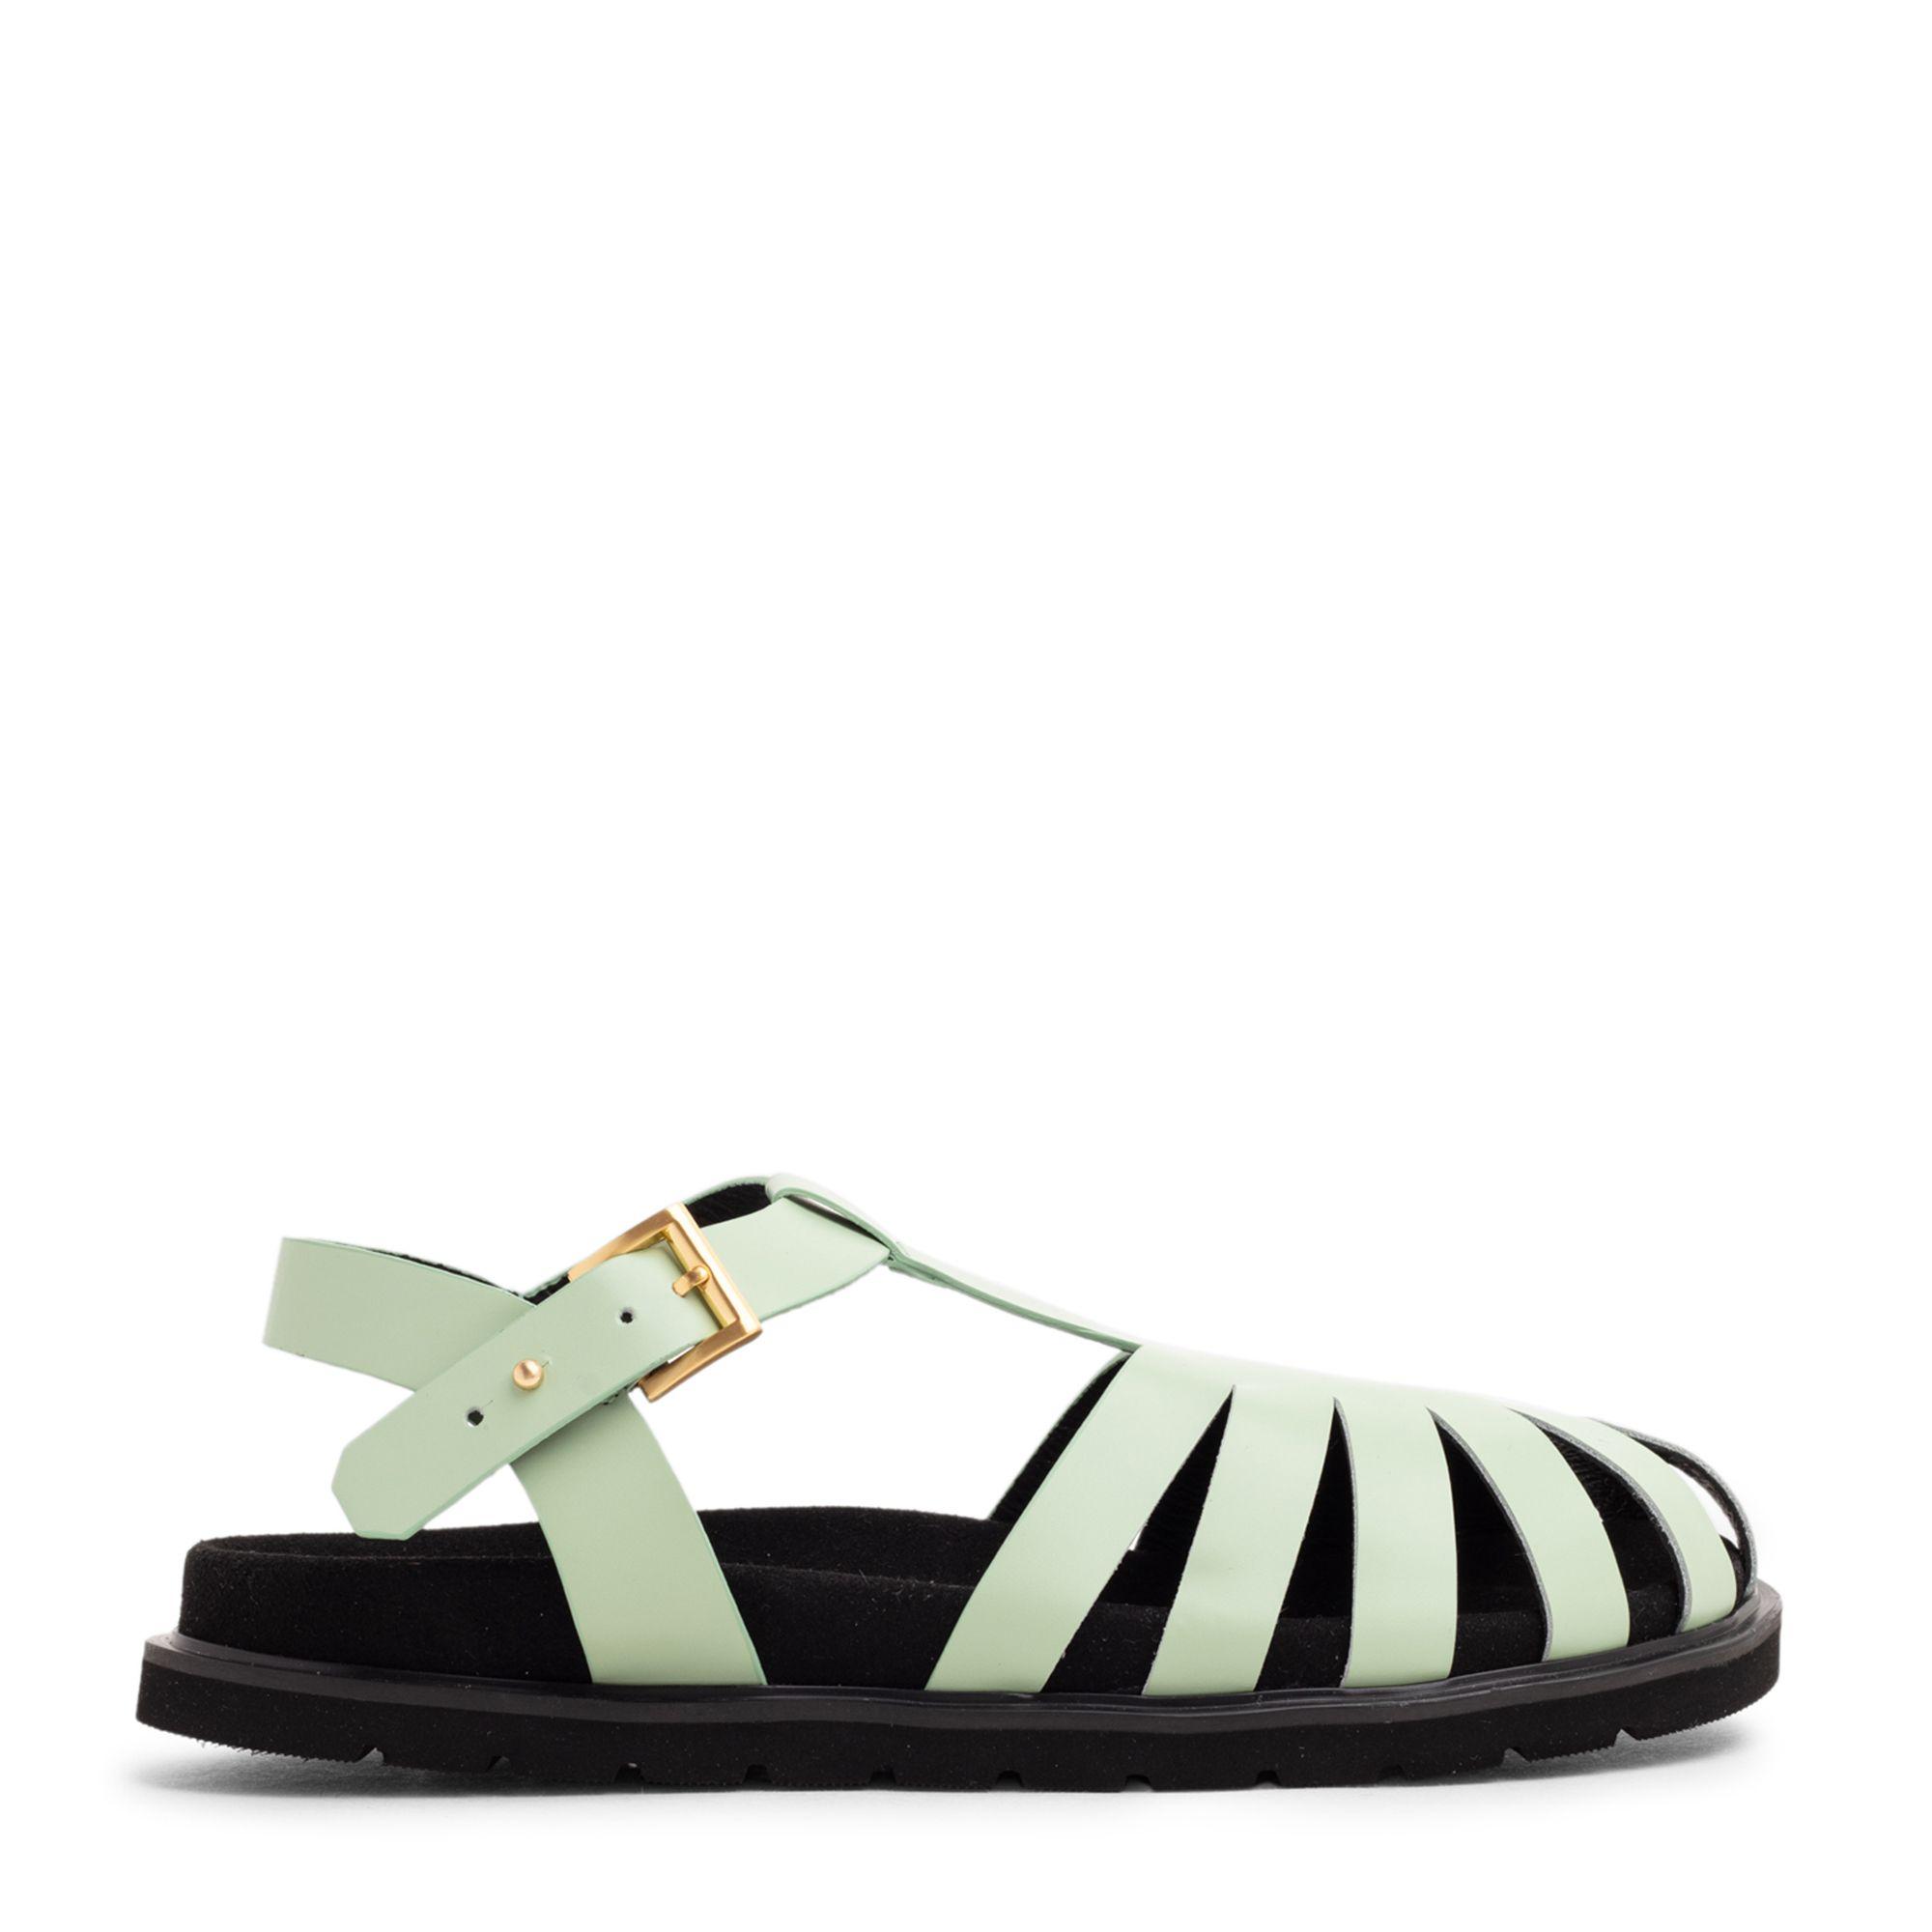 Asterisk sandals